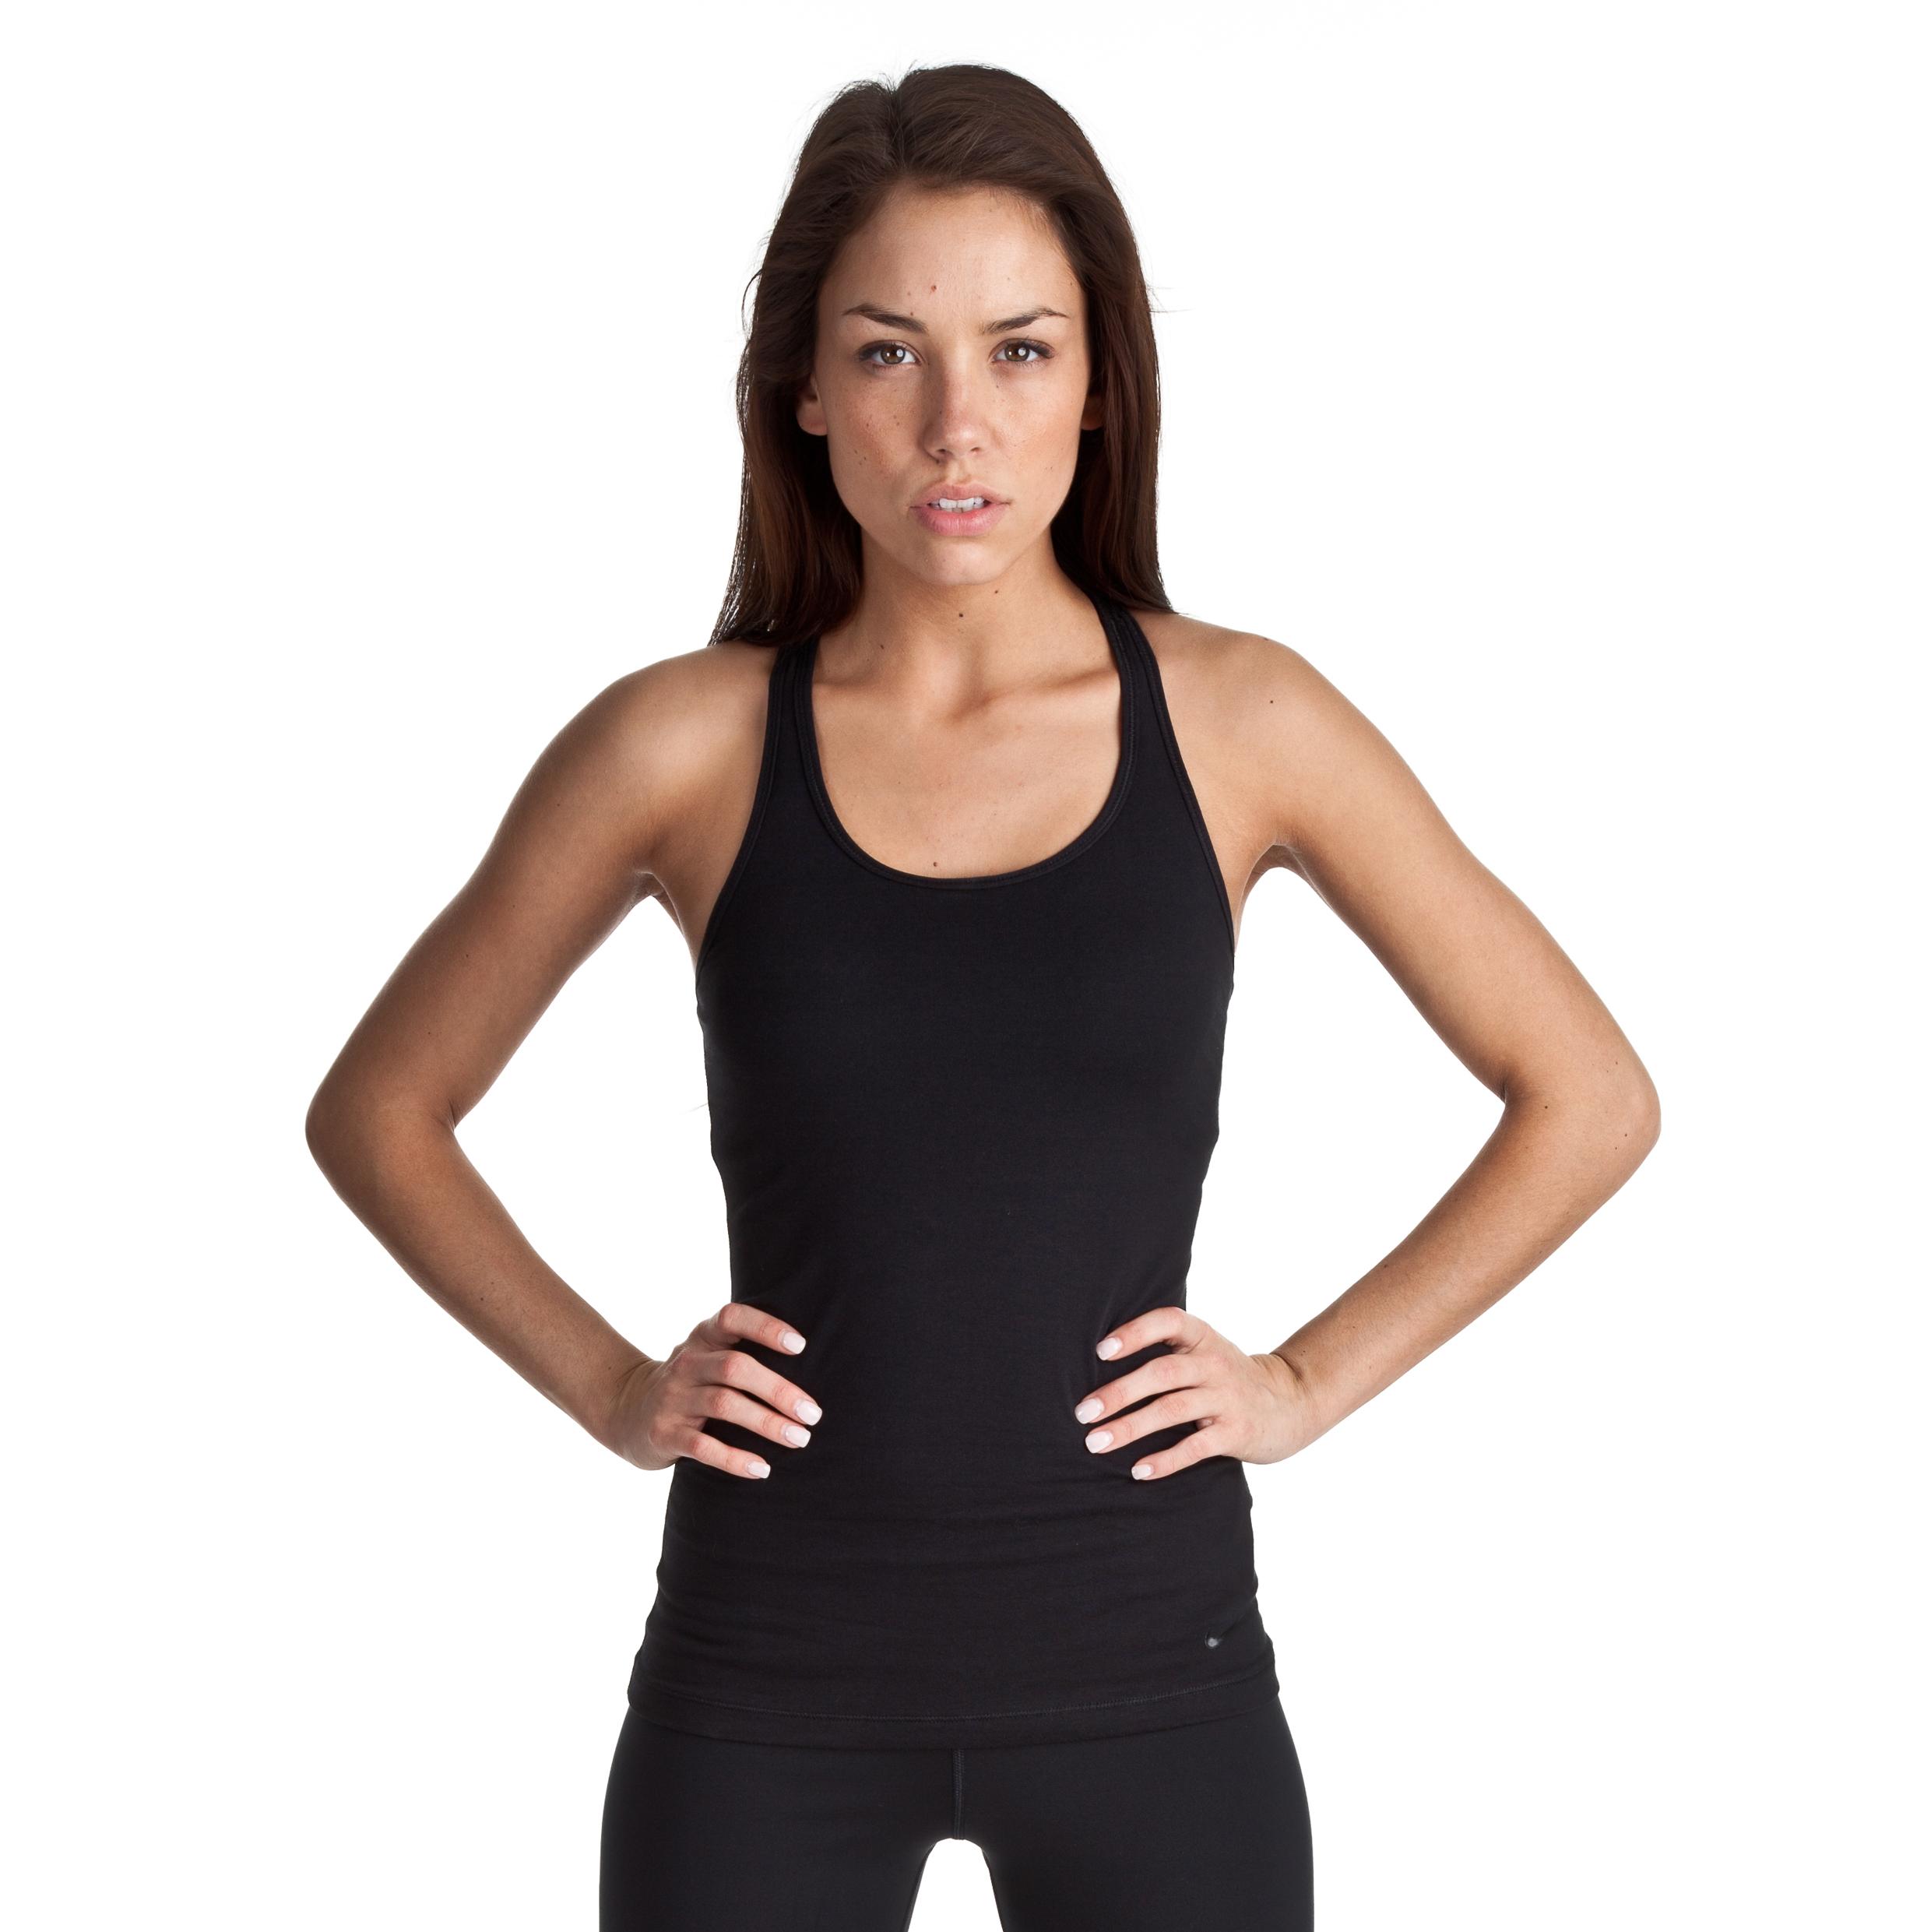 Nike Lean Tank - Black/Black - Womens